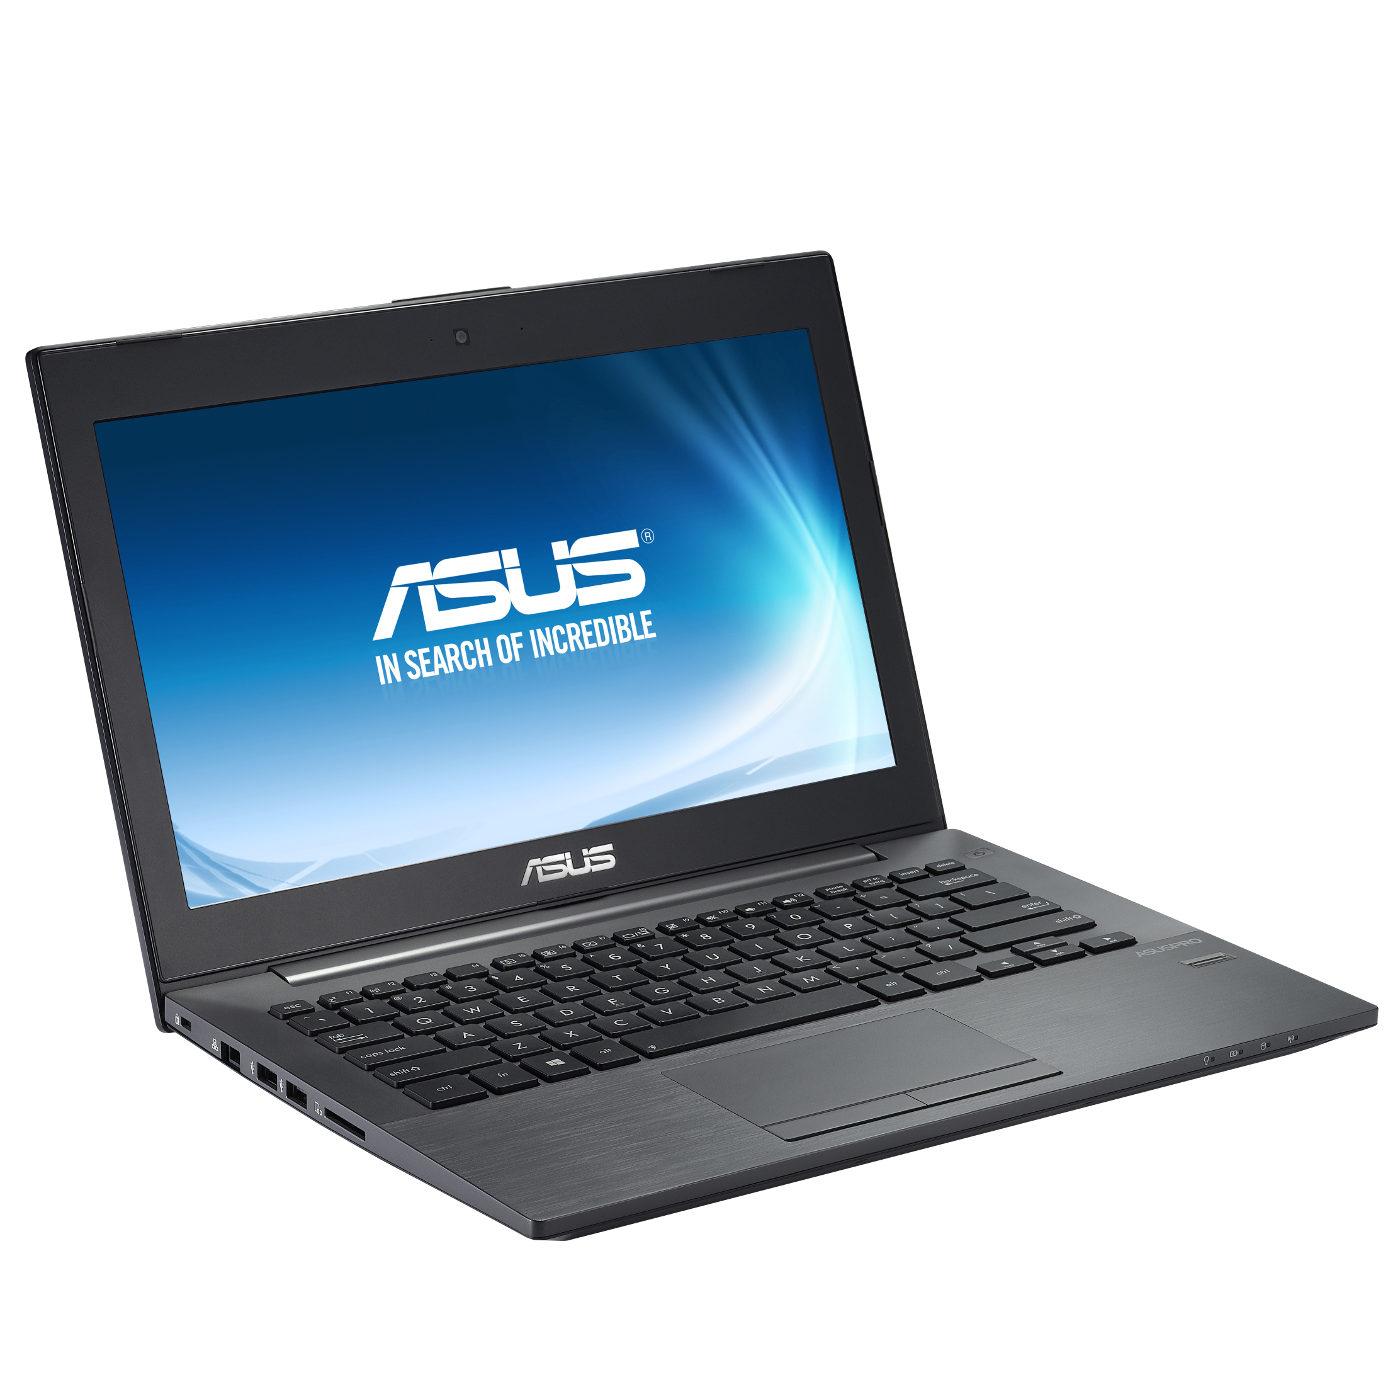 "PC portable ASUS PU301LA-RO032G Intel Core i3-4010U 4 Go 500 Go 13.3"" LED Wi-Fi N/Bluetooth Webcam Windows 7 Pro 64 bits + Windows 8 Pro 64 bits (garantie constructeur 1 an)"